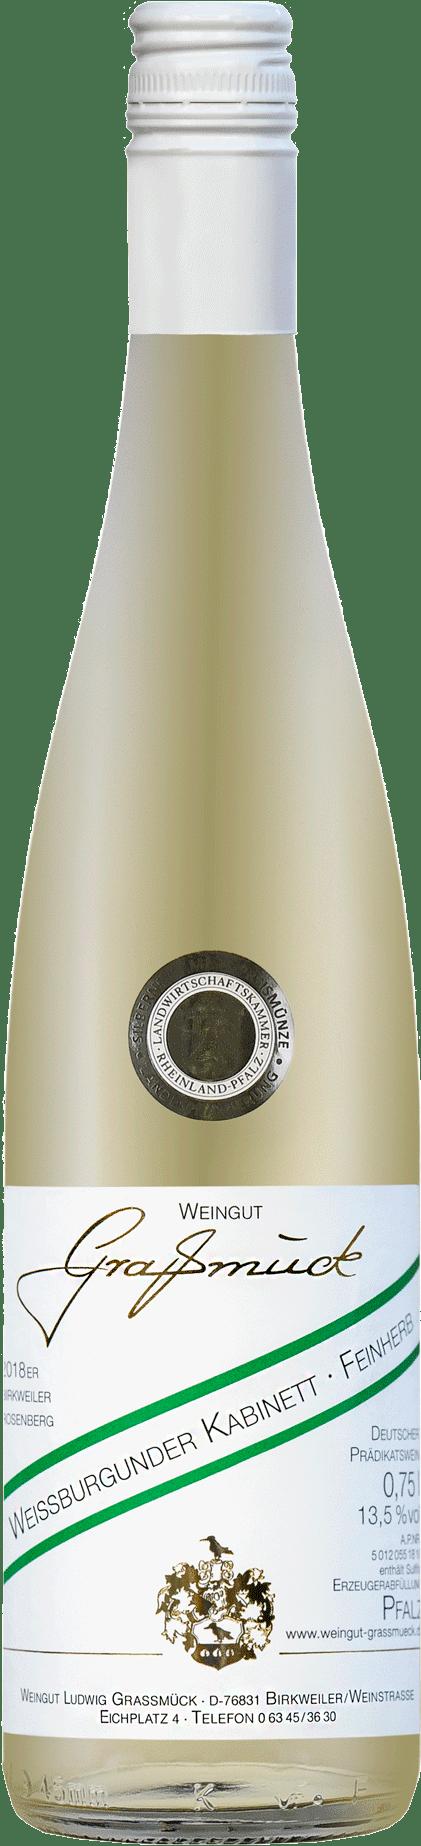 Weingut Ludwig Graßmück, Simon Graßmück, Weissburgunder Kabinett, feinherb 2018